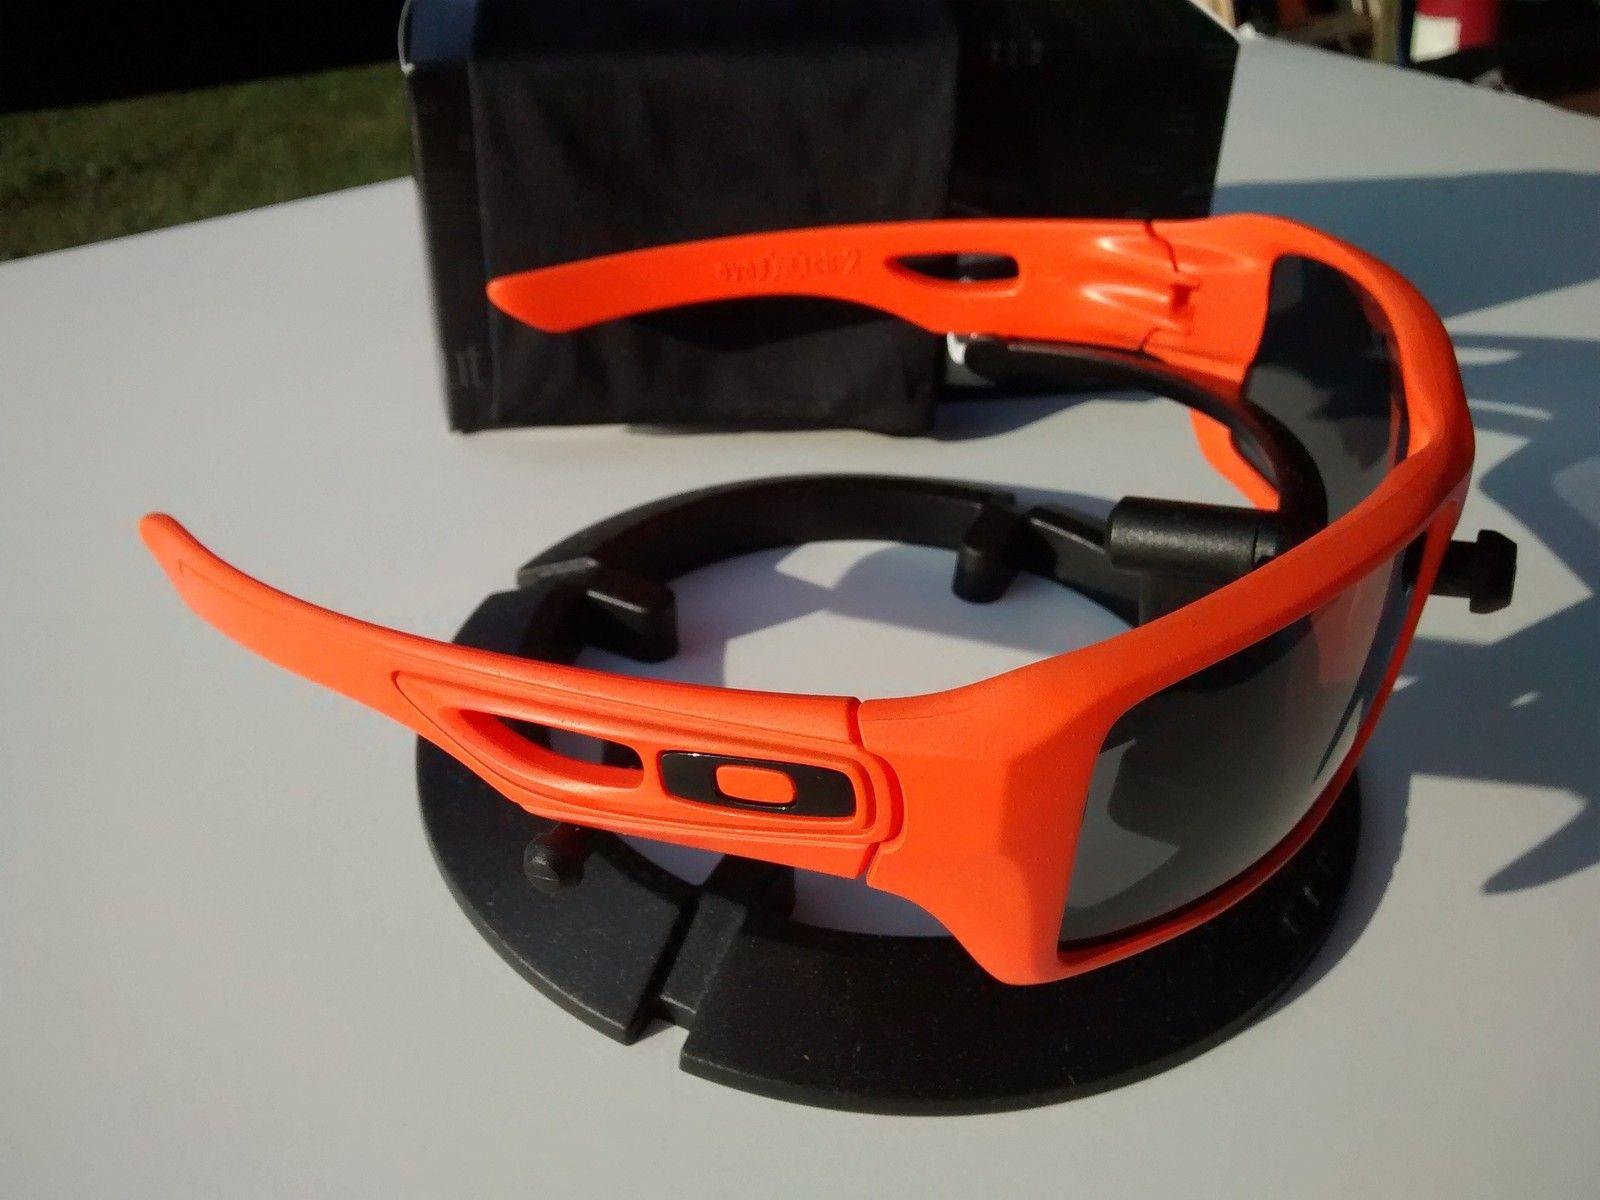 Safety Orange Cerakote Eyepatch 2 - w5UD9yM.jpg